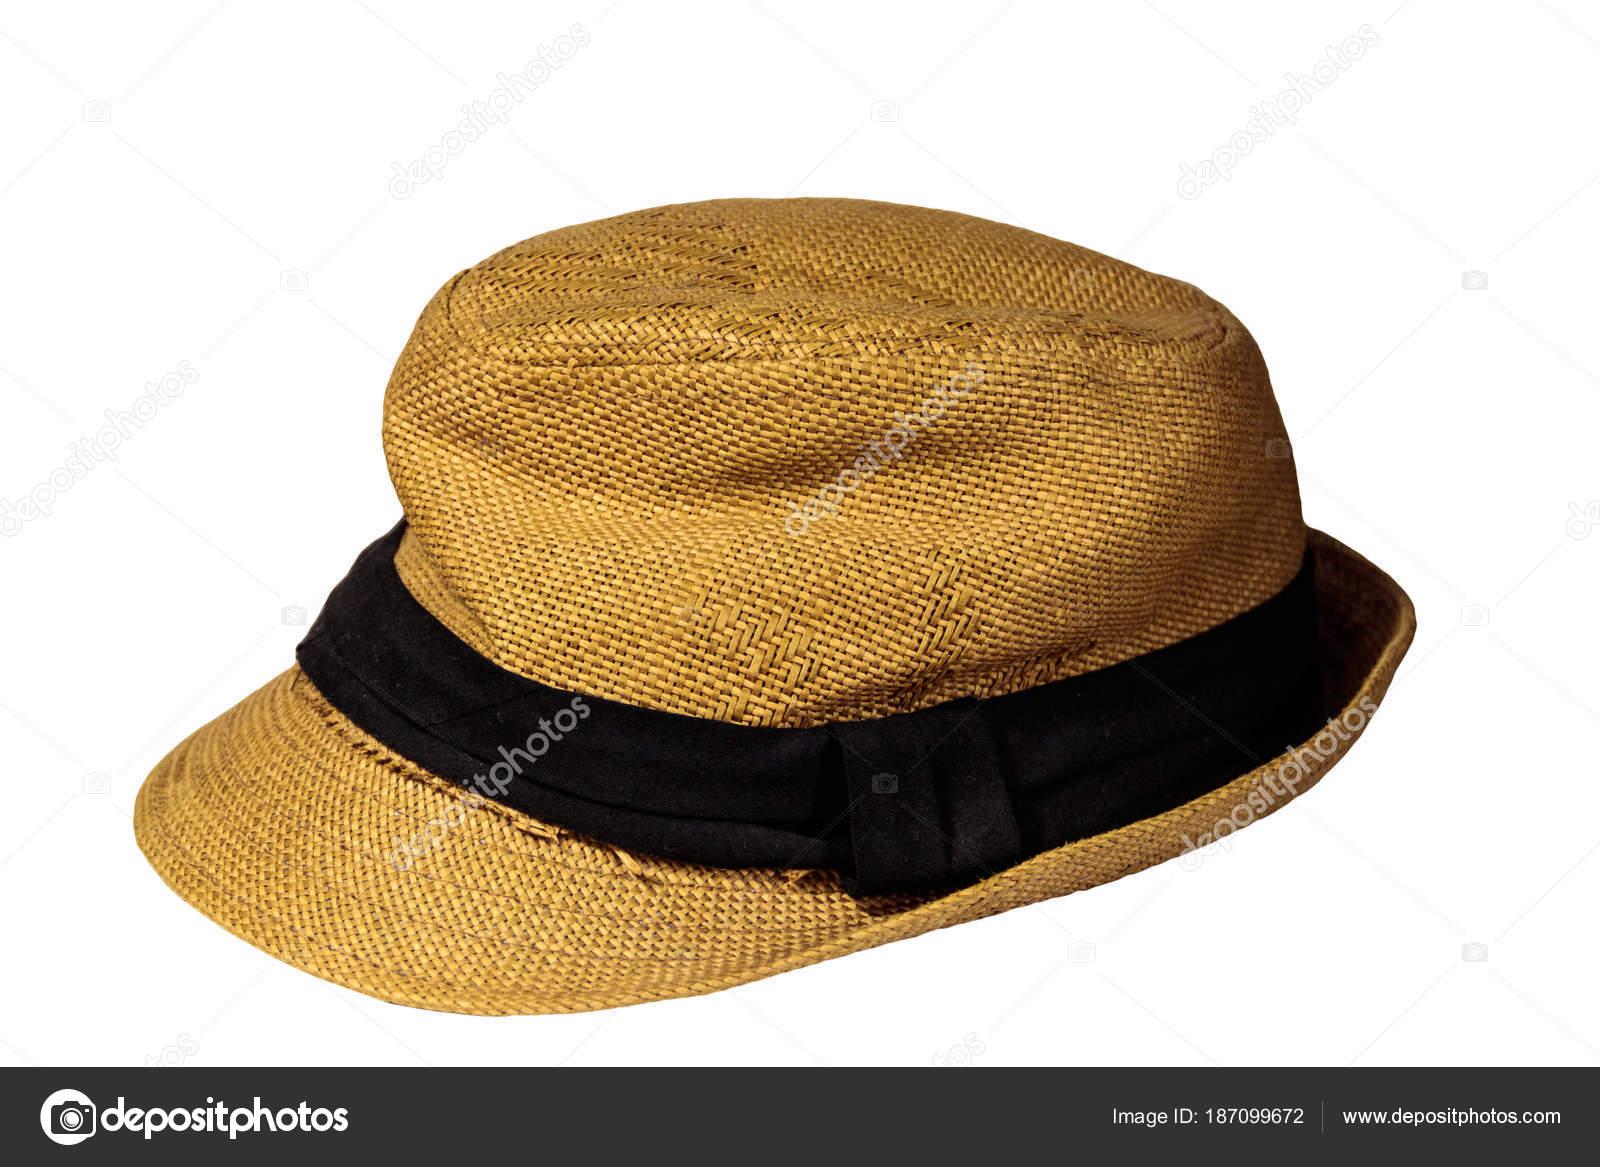 484ab0aa28c95 Chapéu de palha amarelo isolado no fundo branco — Fotografia de Stock